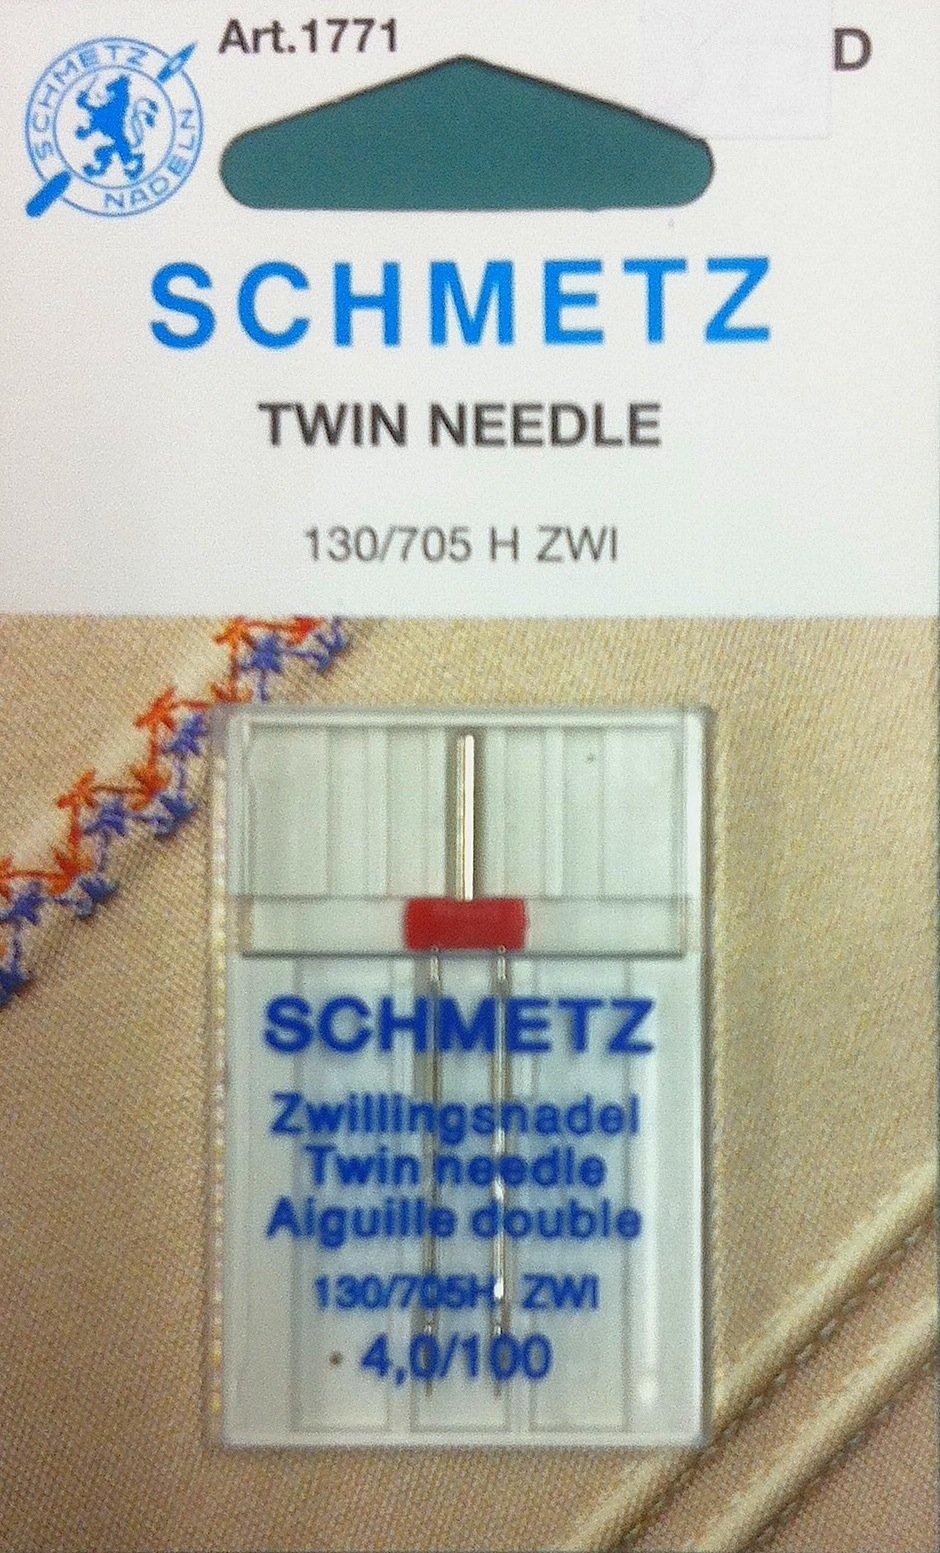 Schmetz Twin Needle 4.0/100